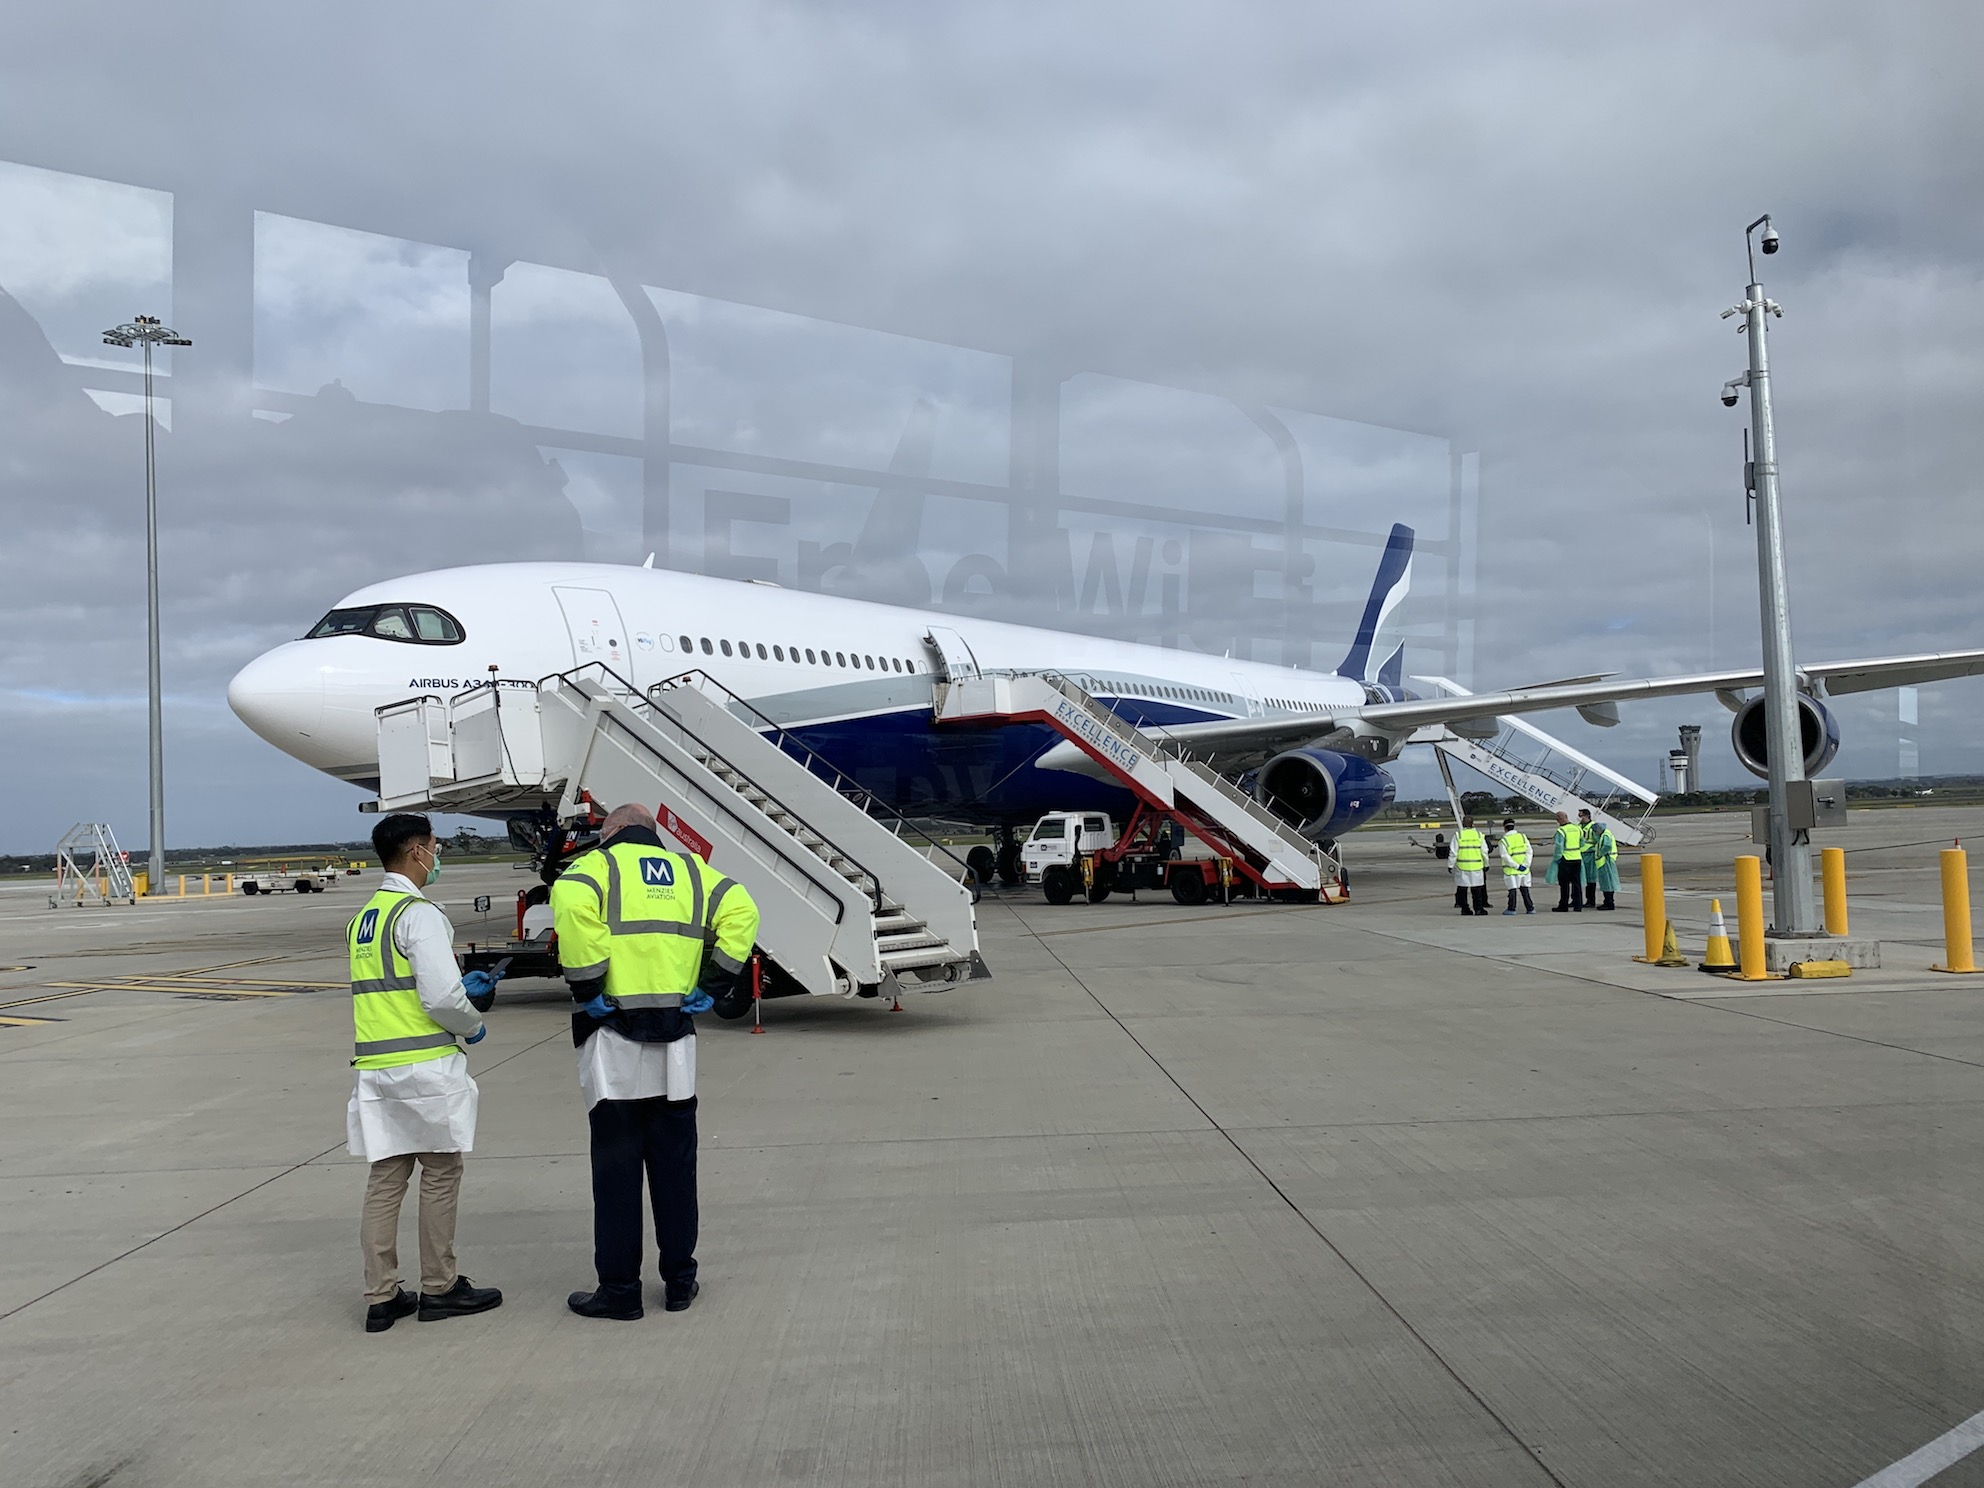 IMG_9746 Airbus on tarmac at Tullamarine small